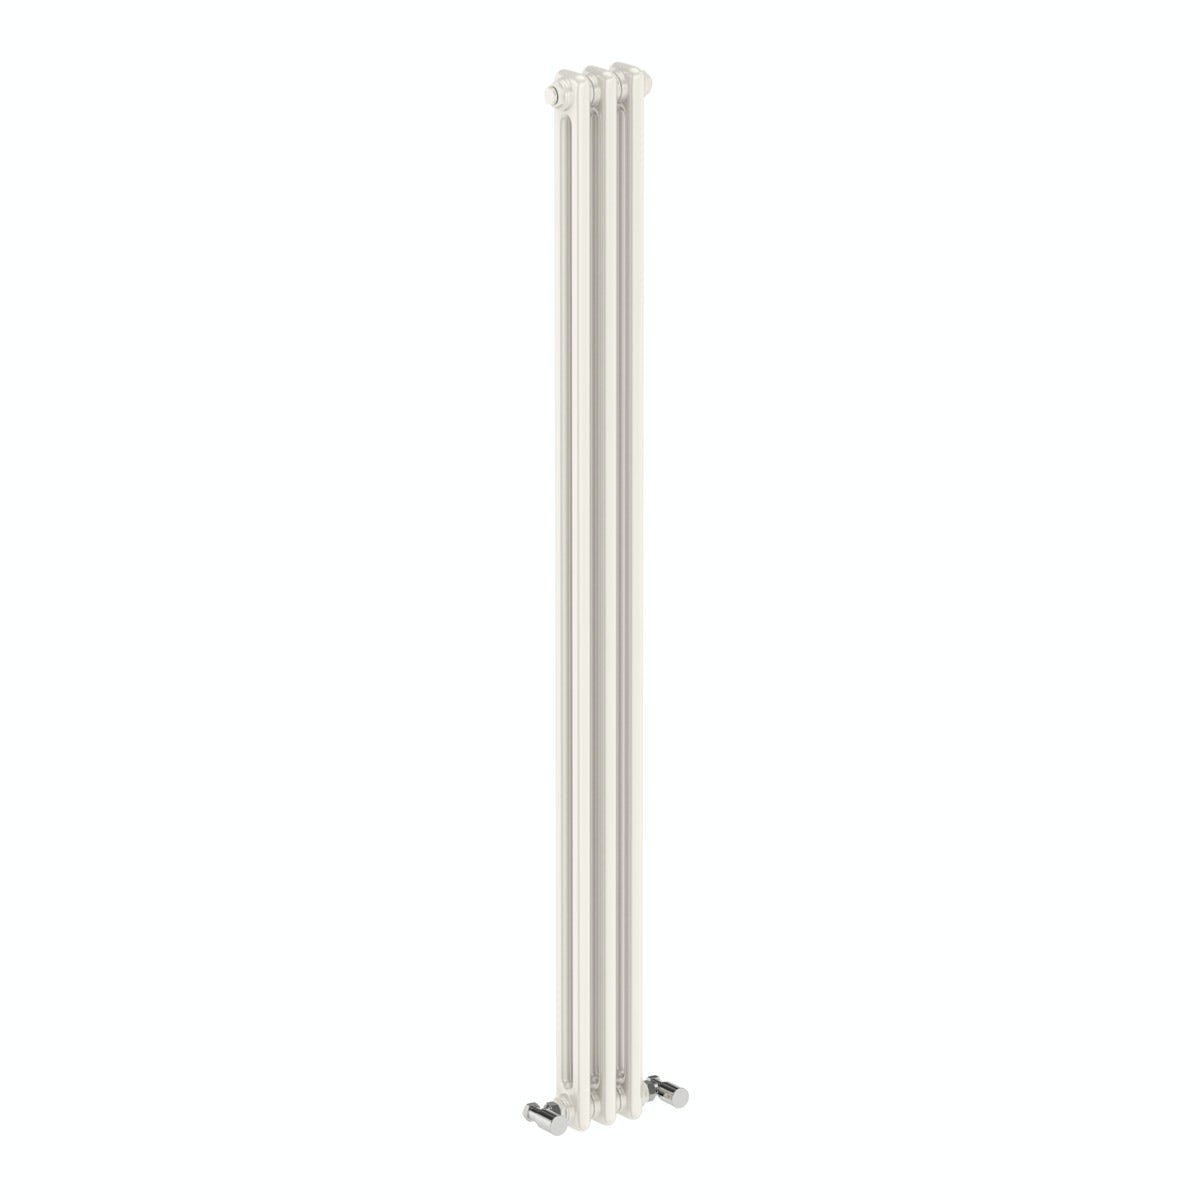 The Bath Co. Dulwich vertical white double column radiator 1500 x 155